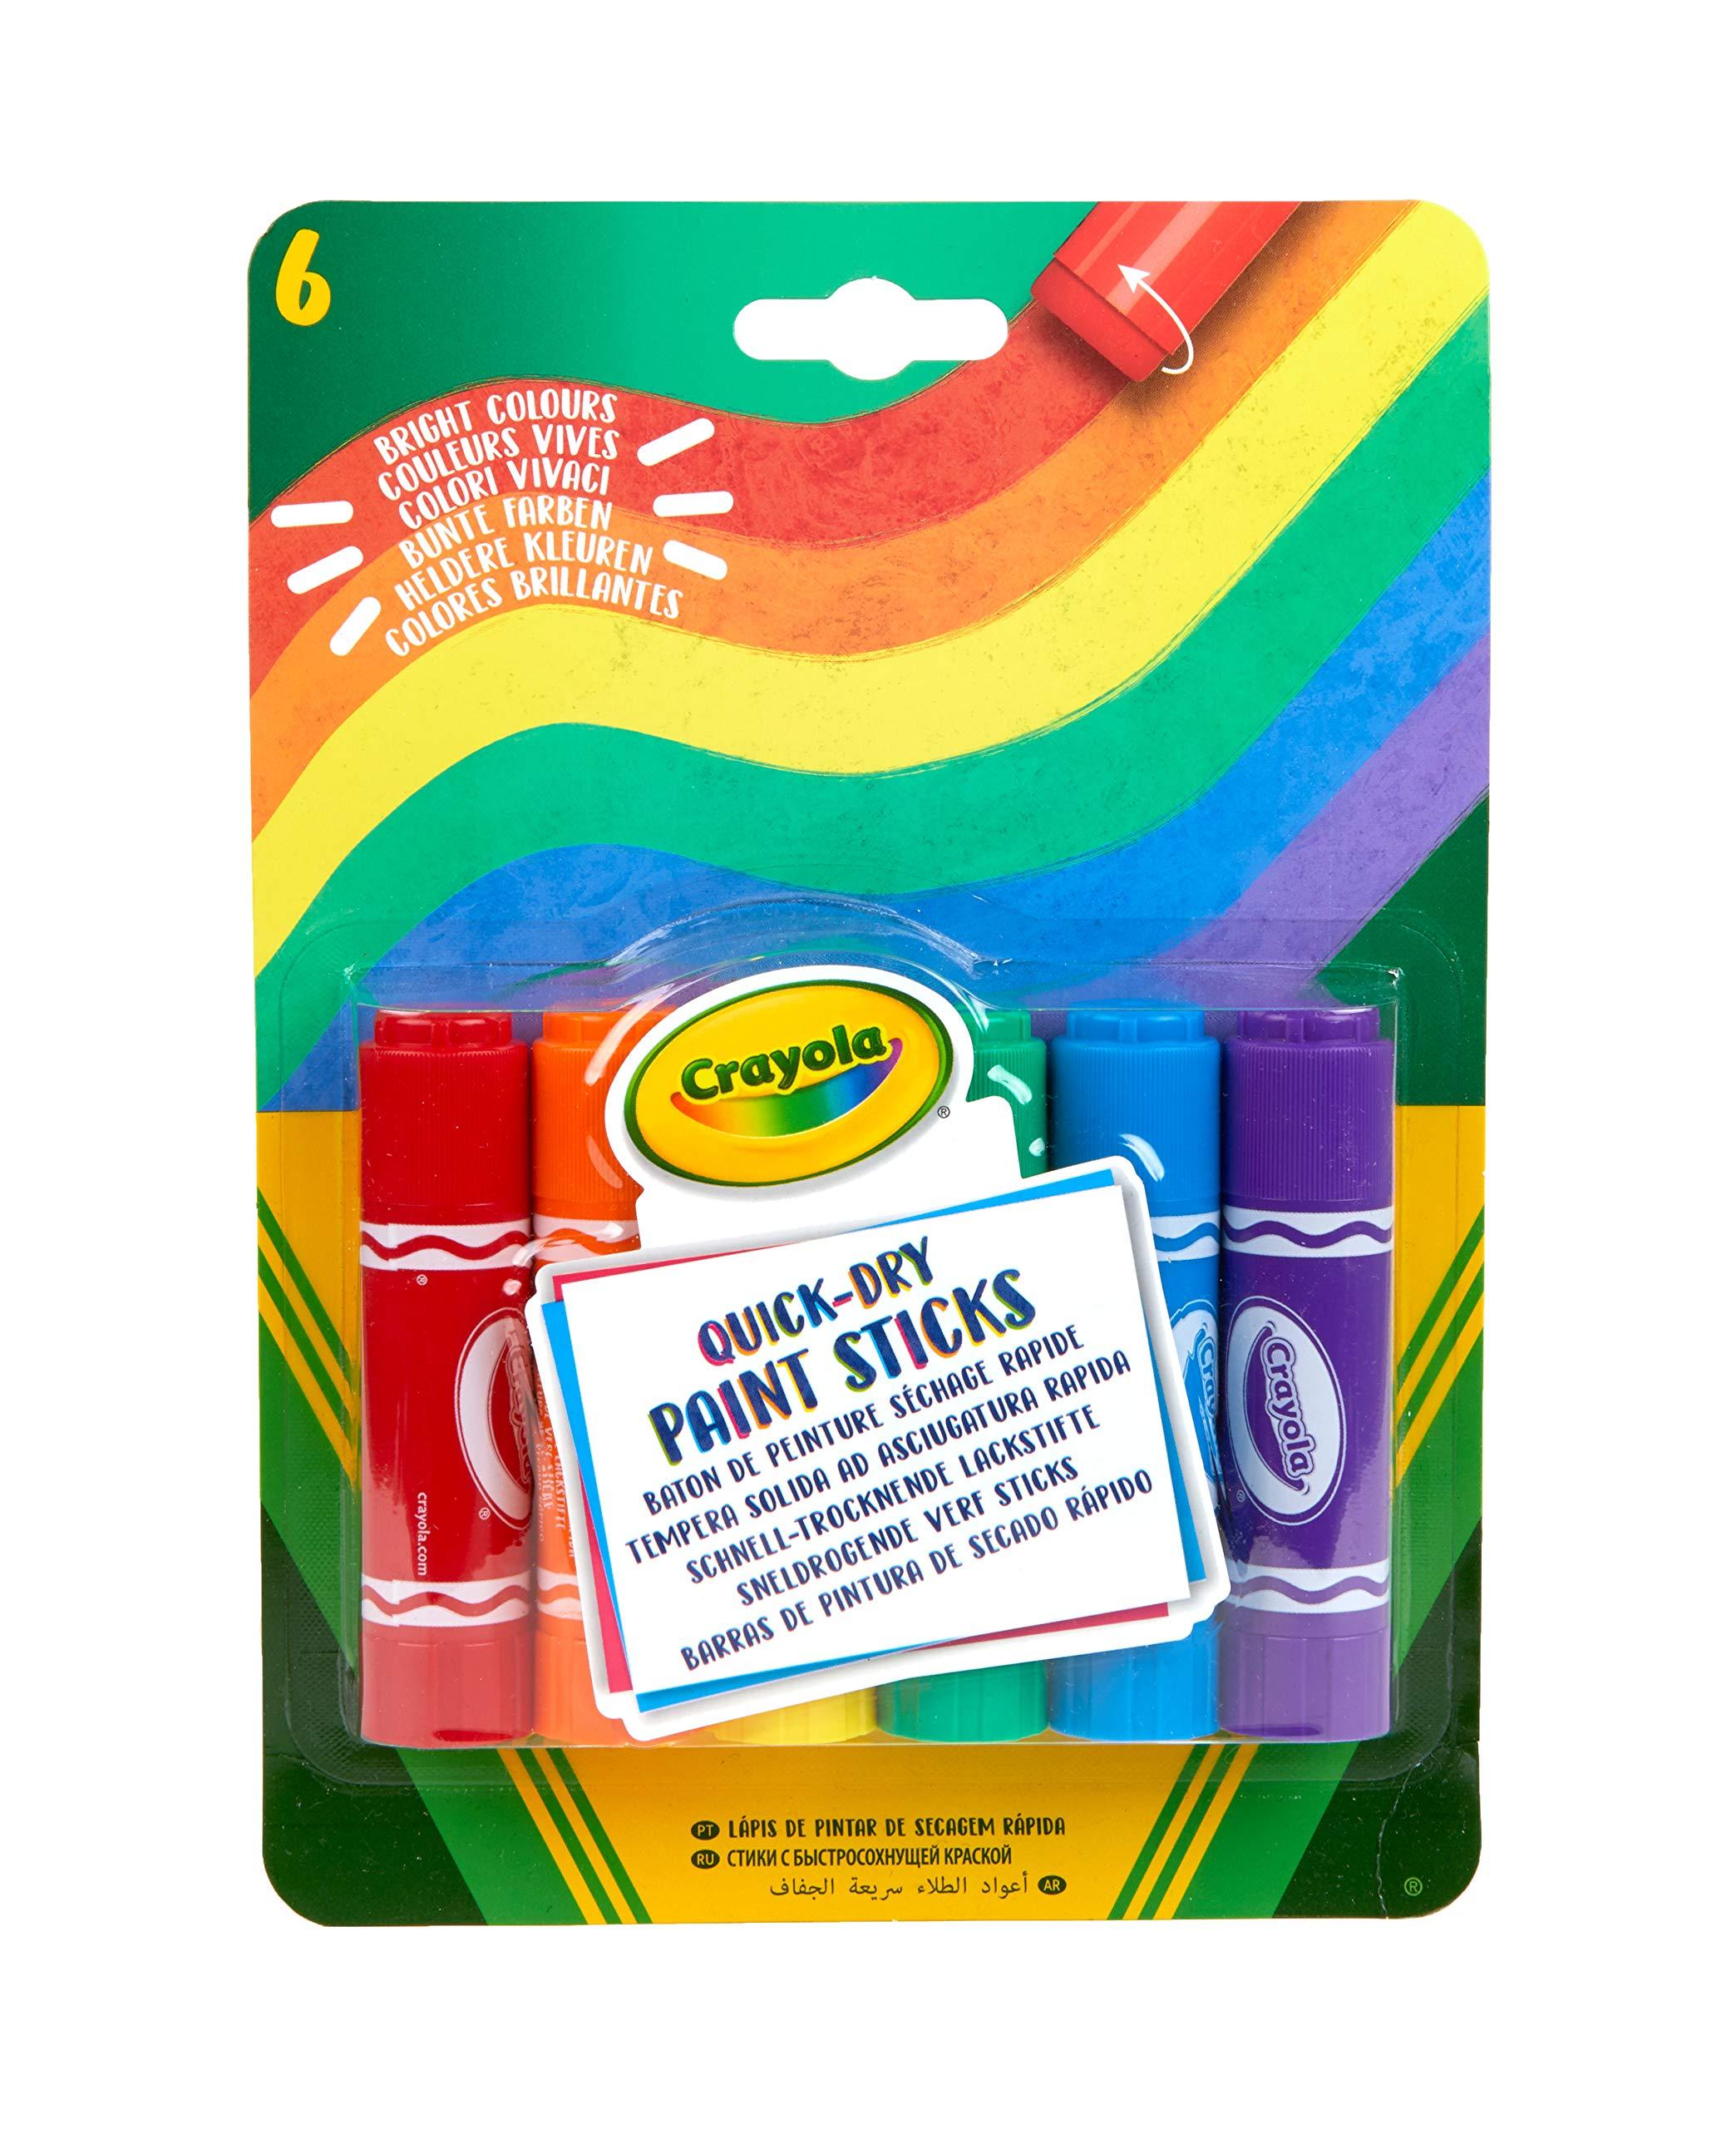 Crayola 6 Paint Sticks